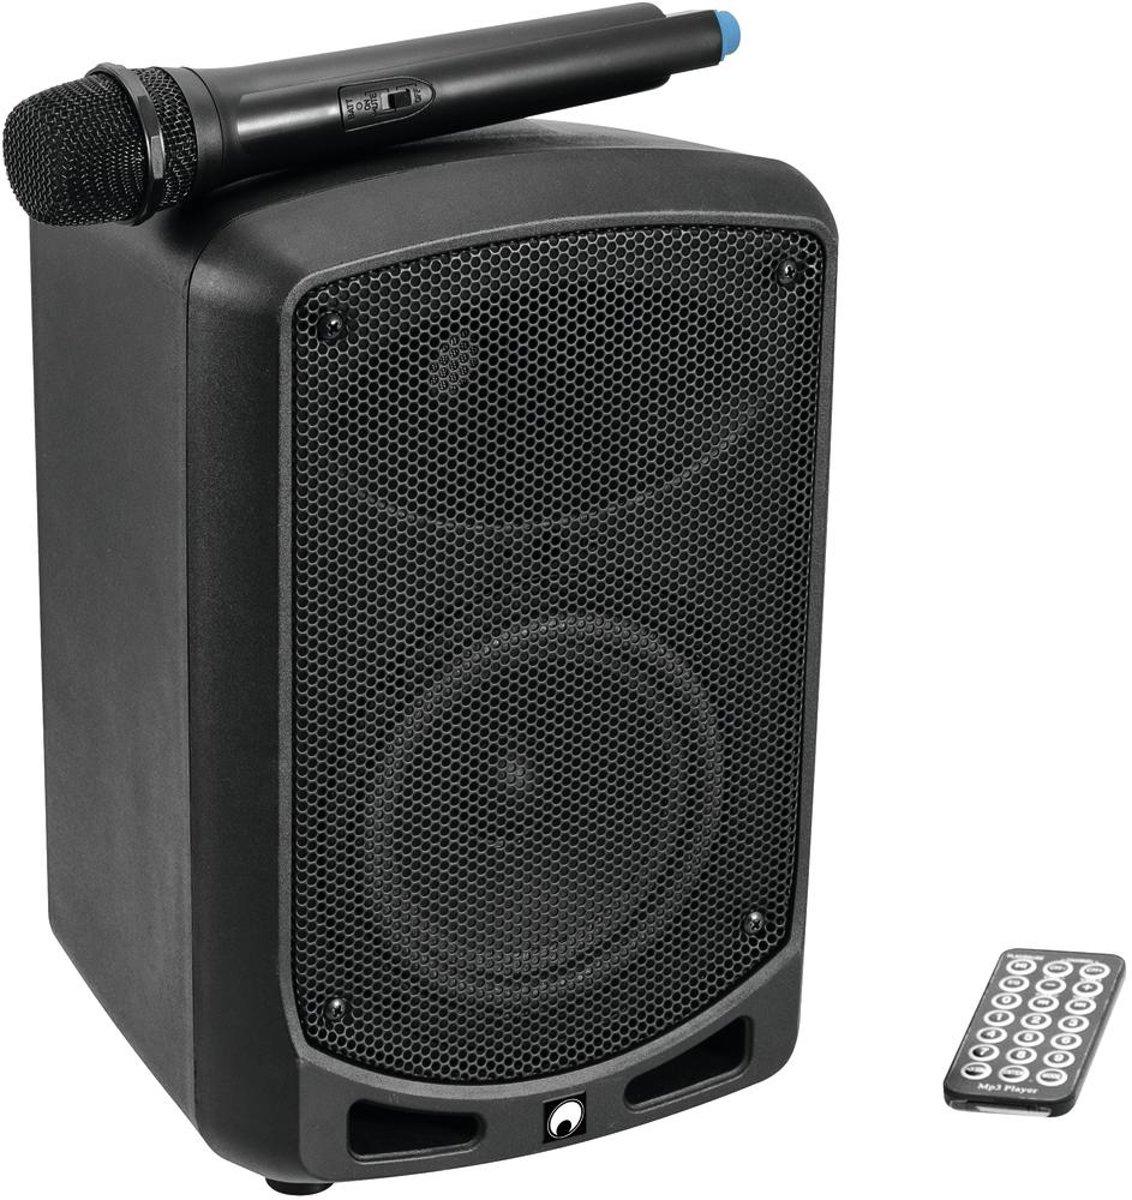 OMNITRONIC Luidspreker met microfoon - WAMS-65BT - Mobiele geluidsset met microfoon en bluetooth kopen